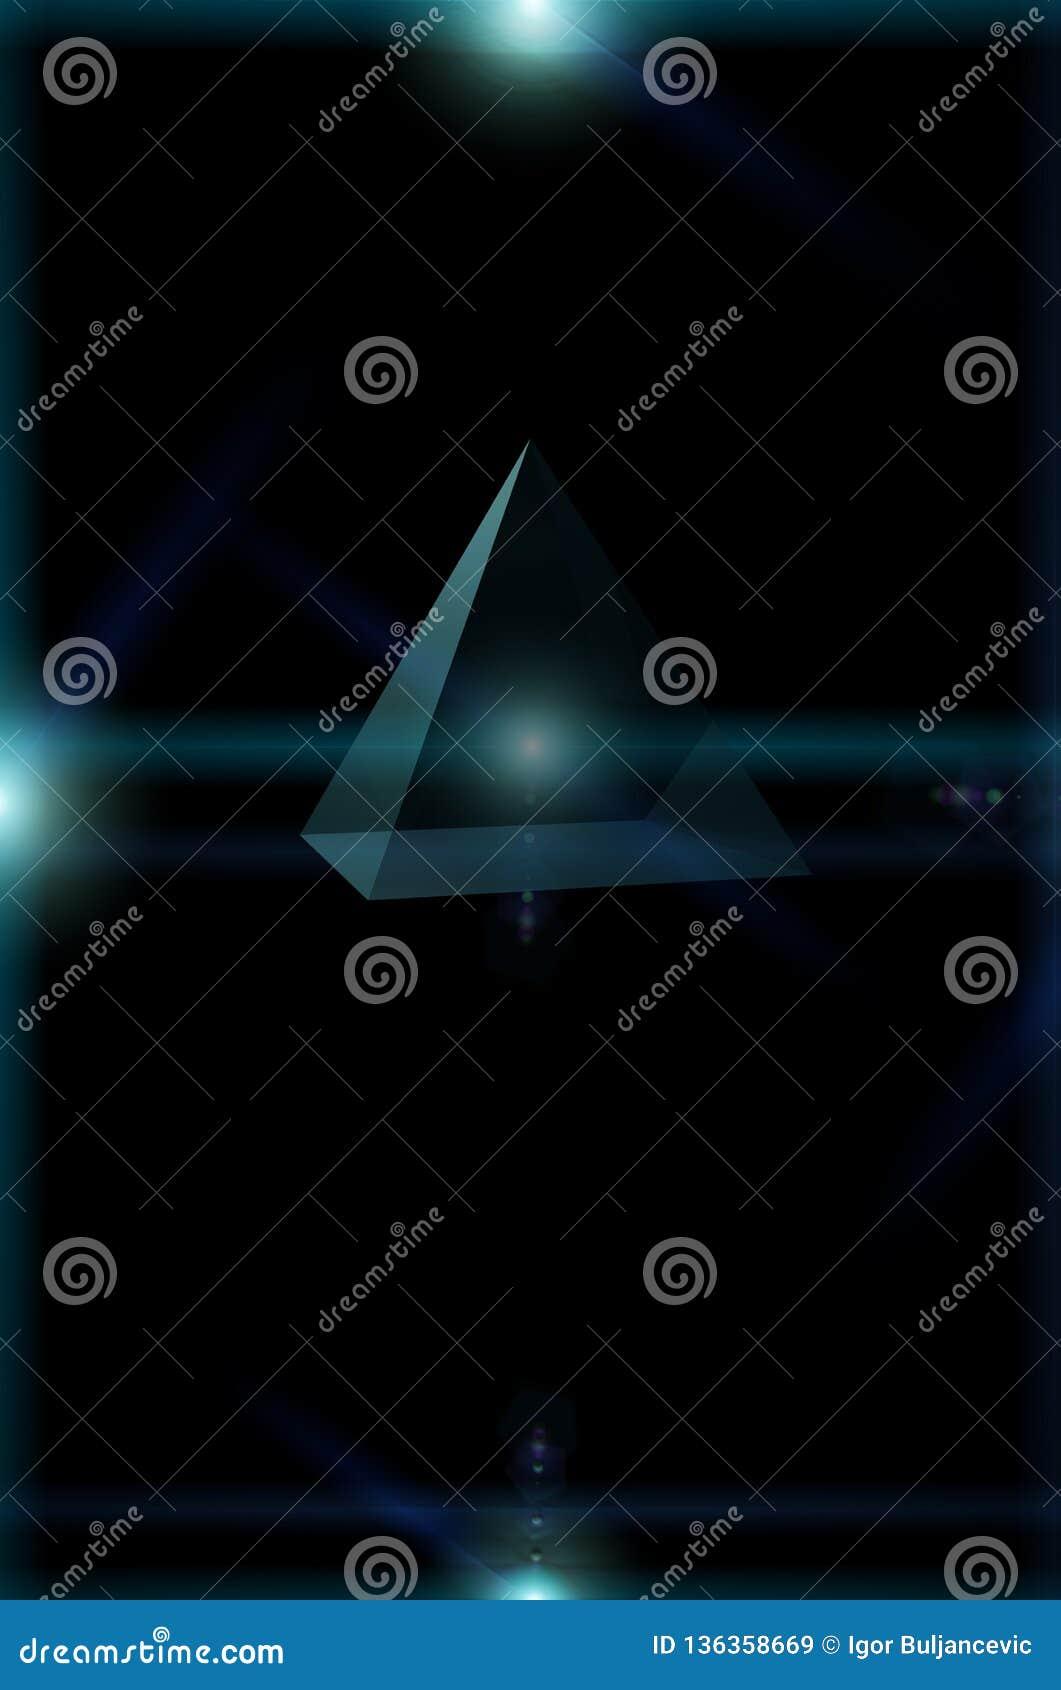 3D driehoek die die in open plek, driehoek vliegen door sterlichten wordt omringd, zonne-energievoeding